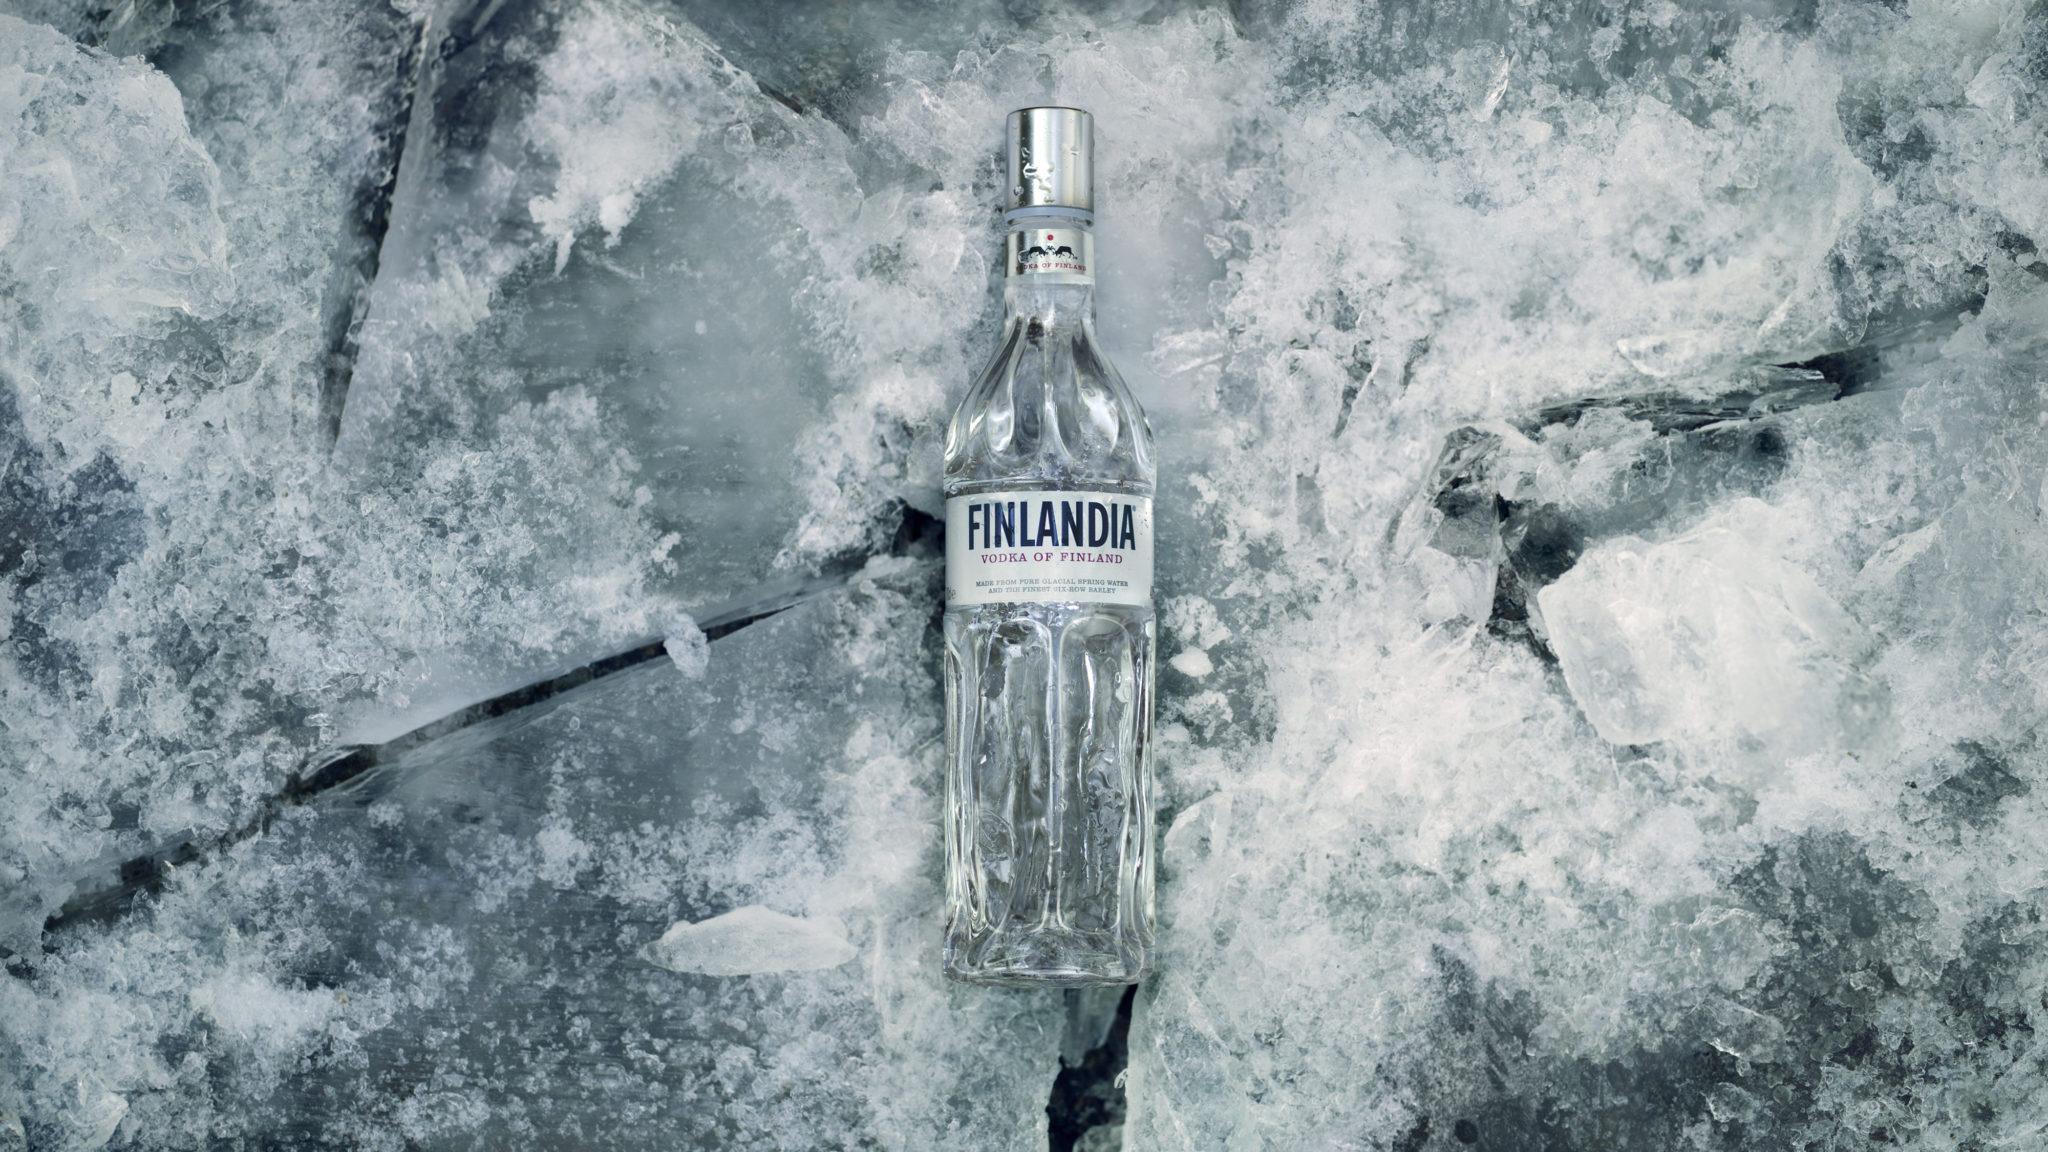 4298_Finlandia_In_Ice_r7_Crop